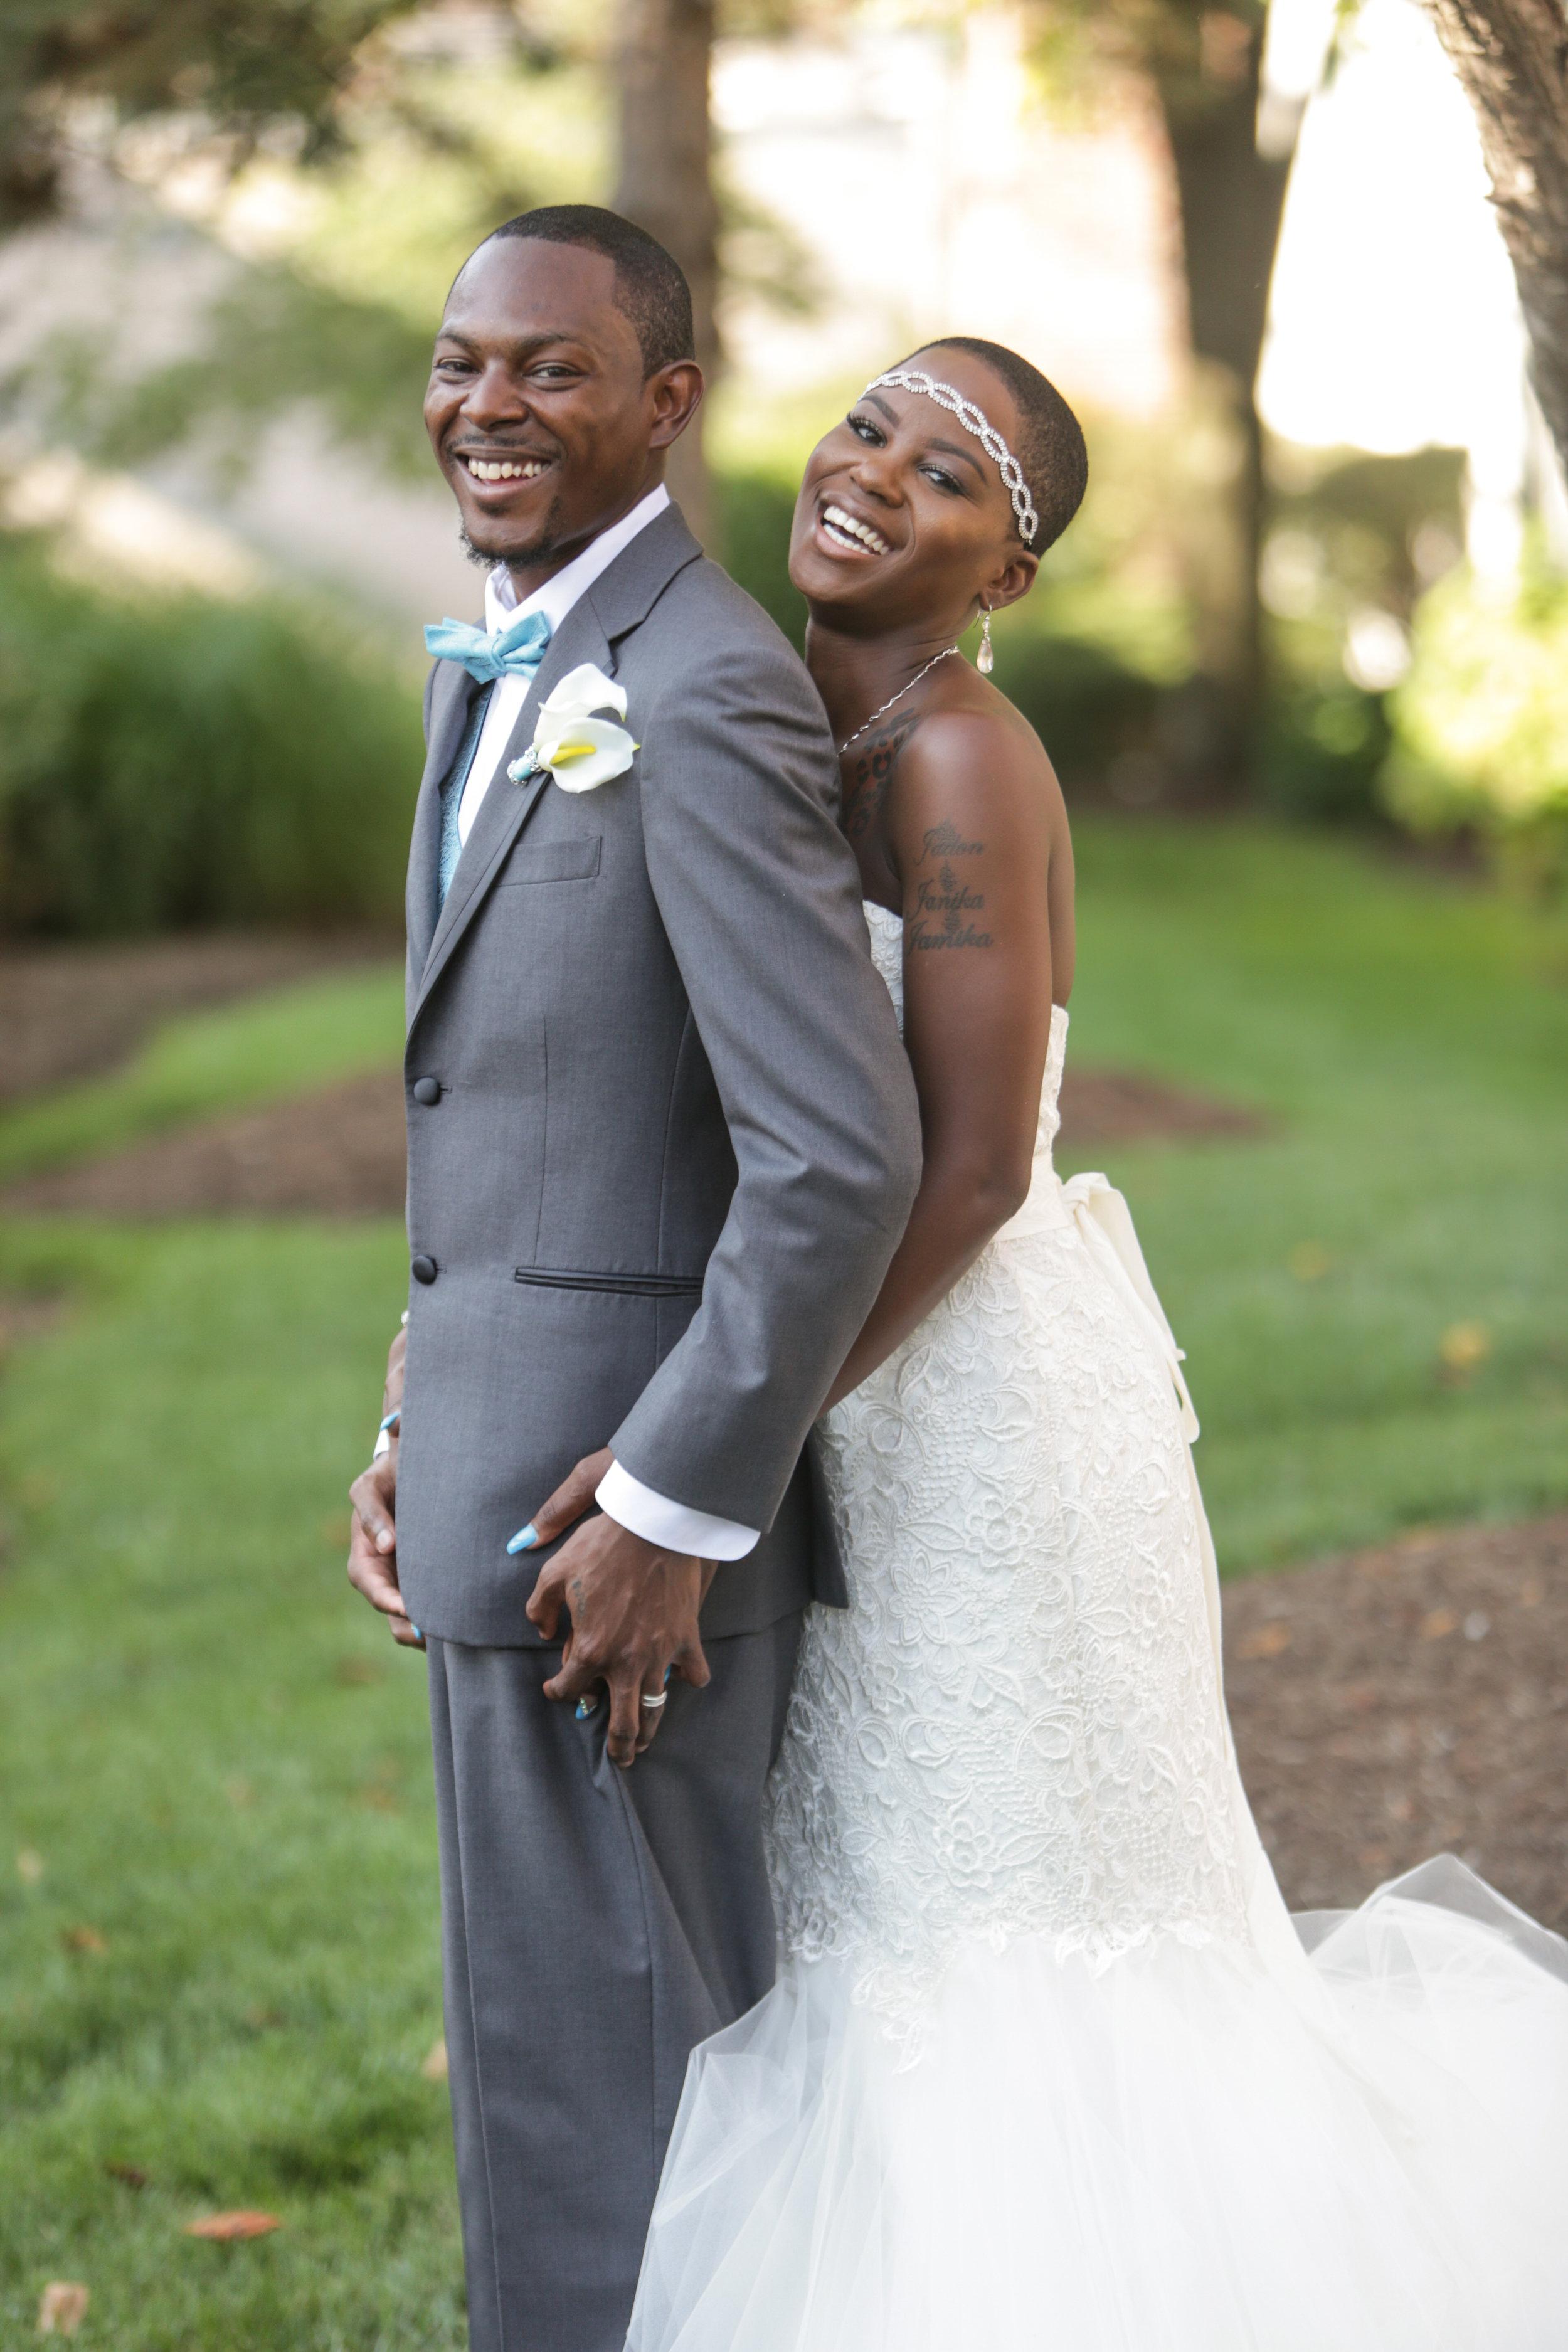 St. Louis Photographer St. Charles Photographer Engagement Wedding Photographer (36).jpg